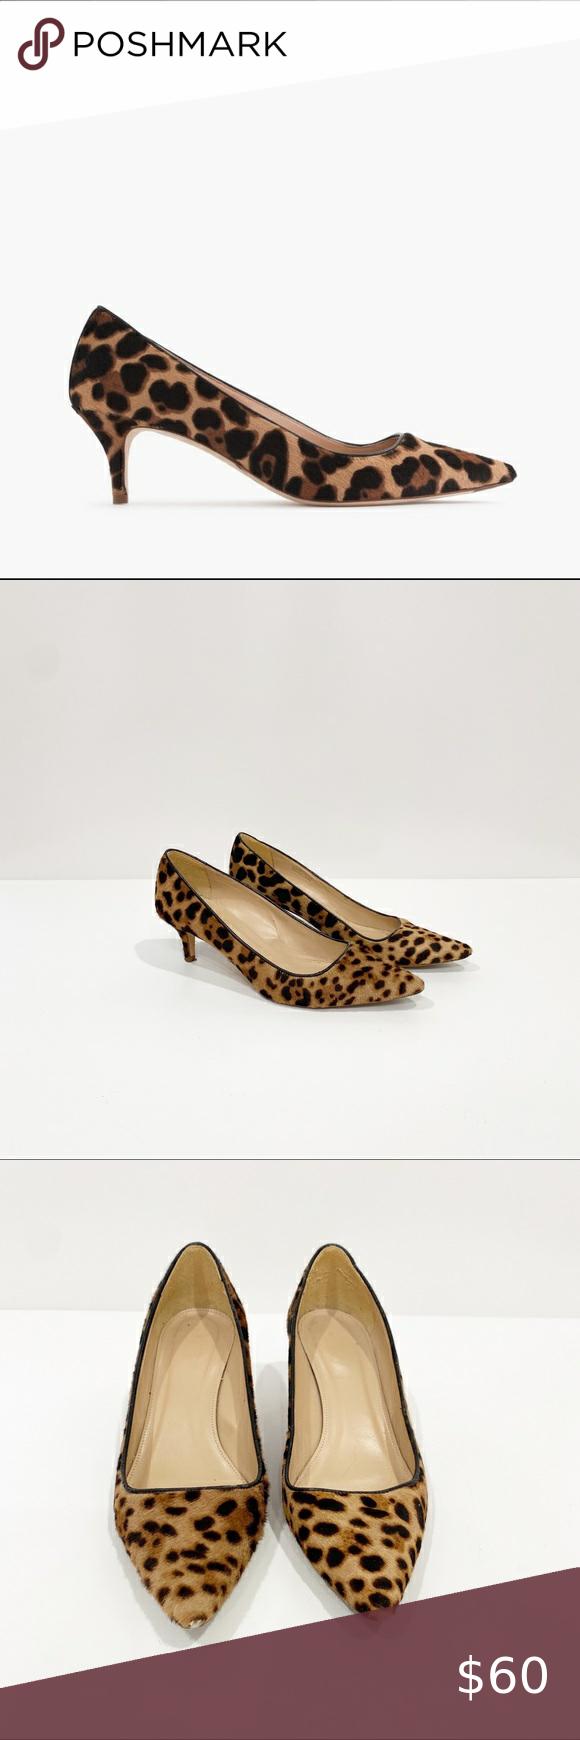 J Crew Dulci Leopard Calf Hair Kitten Heels 7 5 In 2020 Shoes Women Heels Kitten Heels Heels